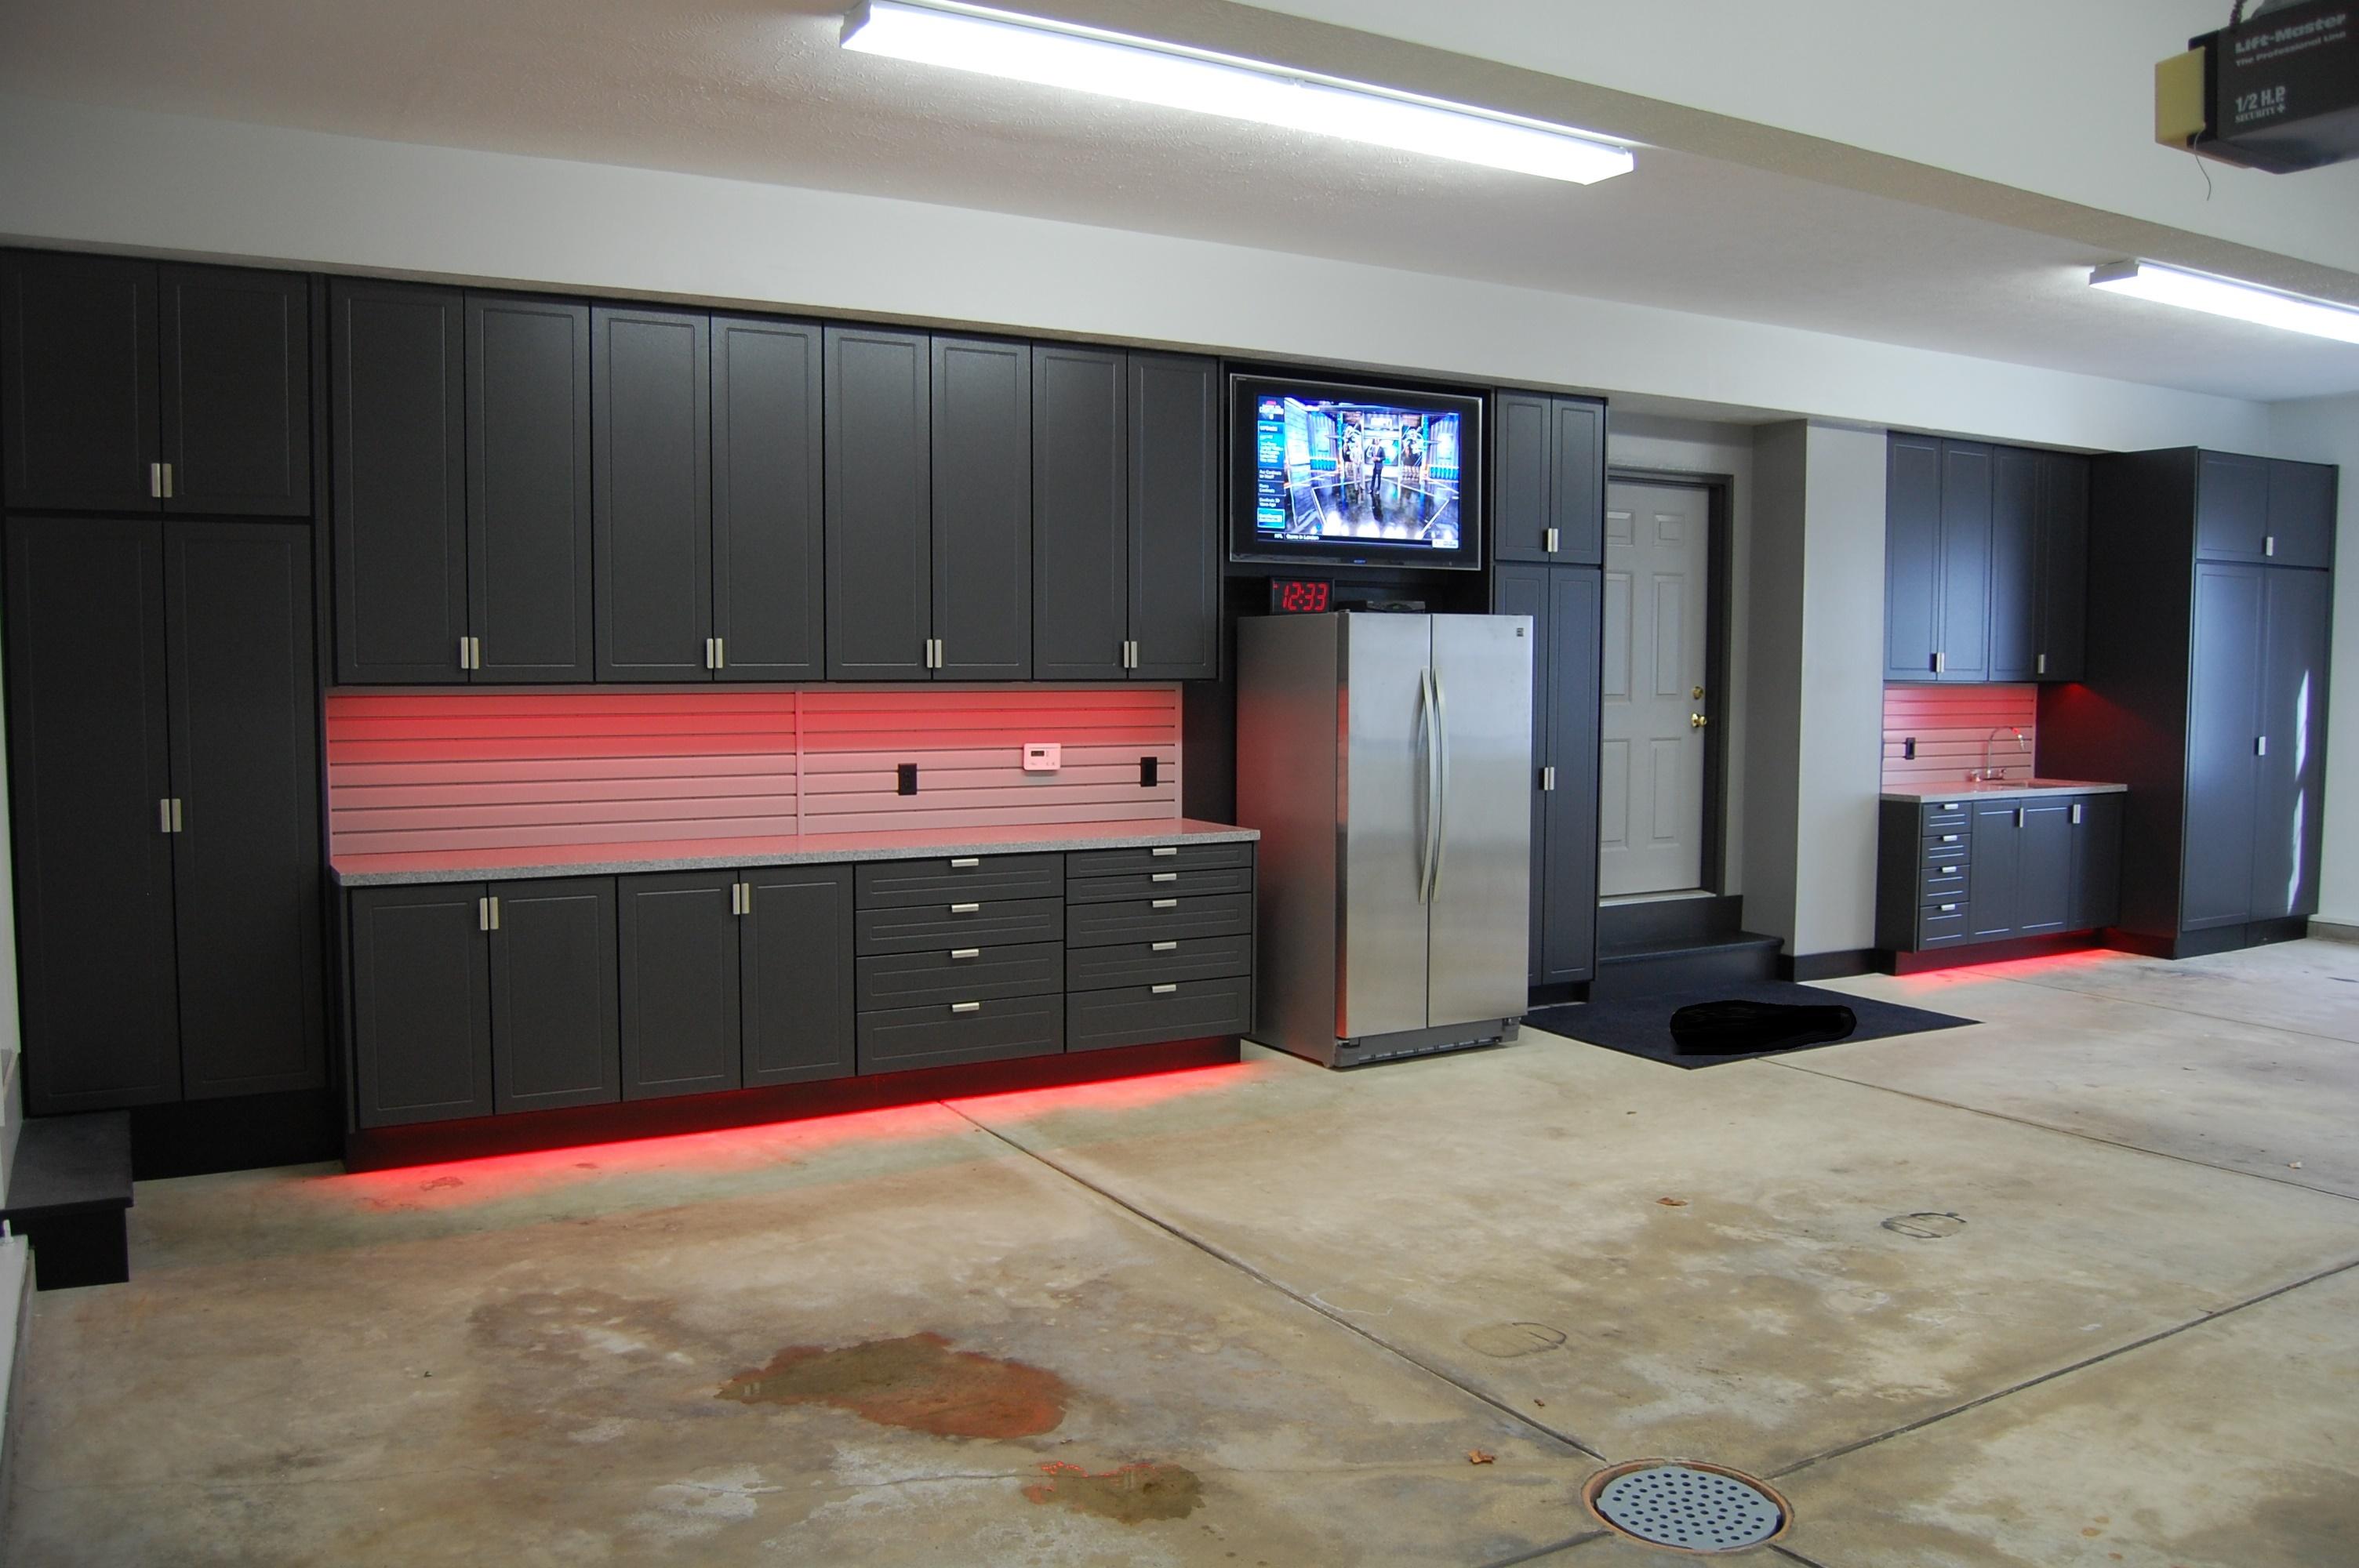 garage cabinets costco | husky storage cabinets | garage storage costco FZASPSM